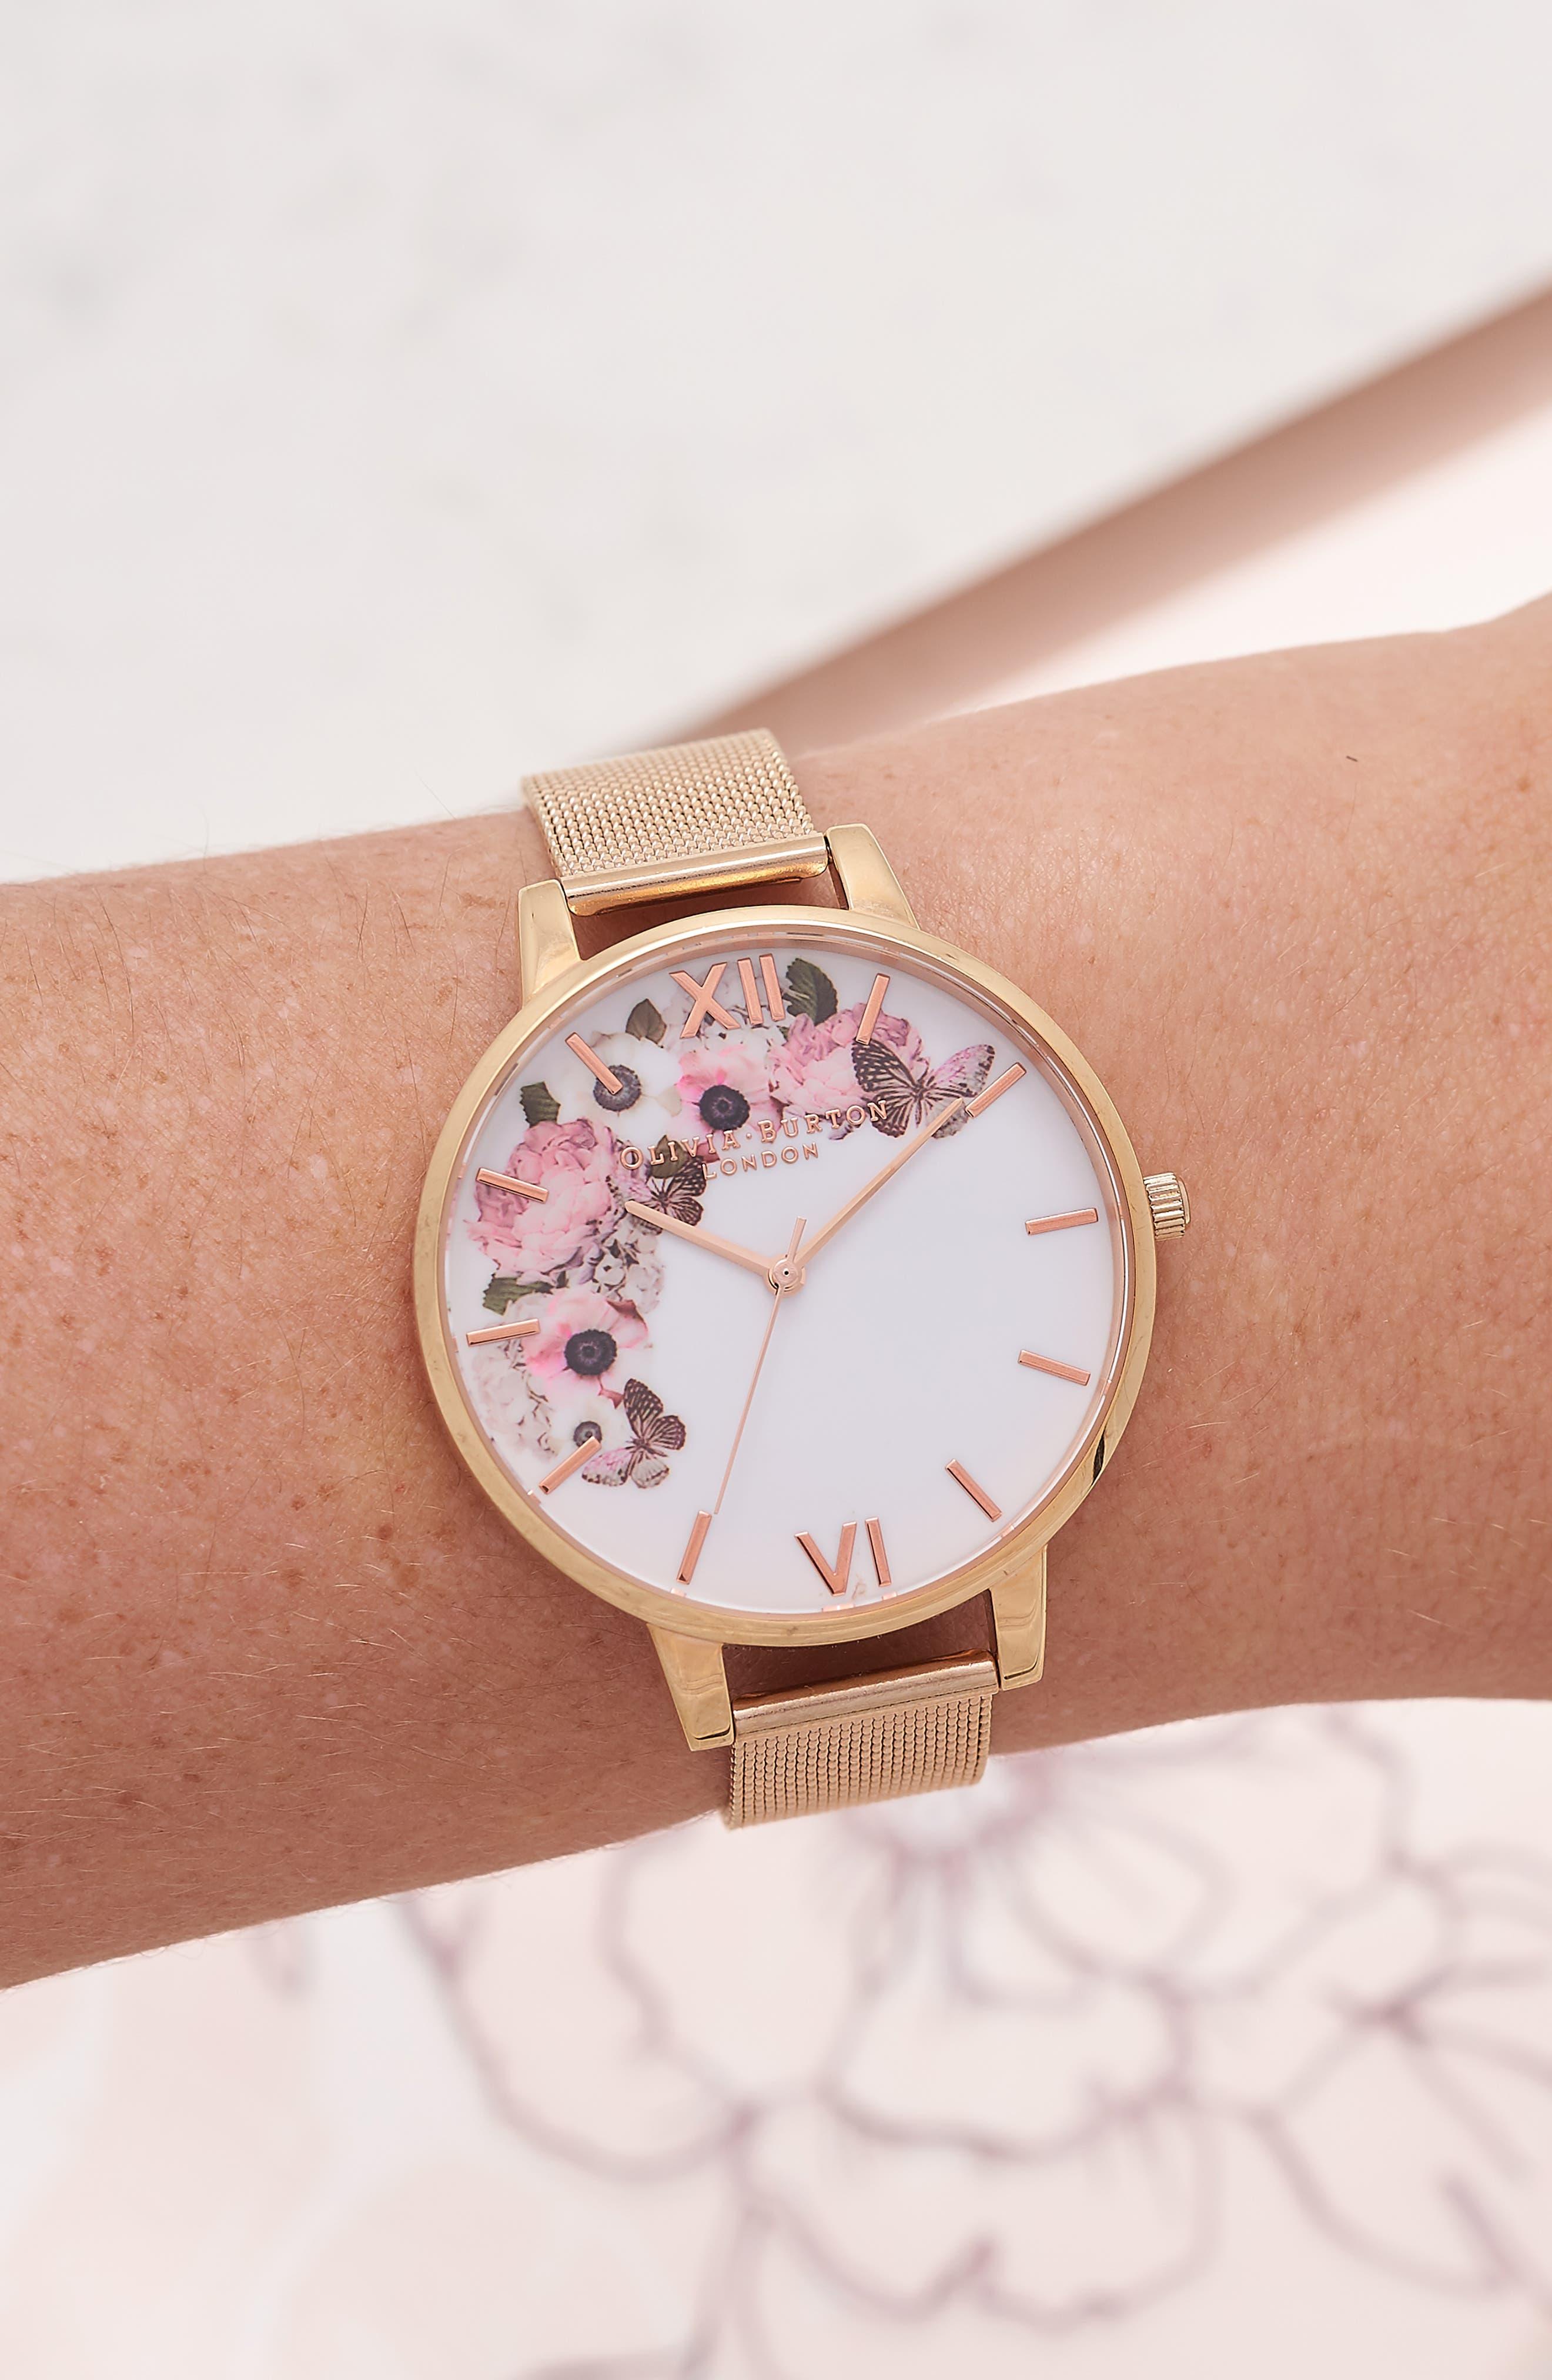 OLIVIA BURTON, Signature Florals Mesh Bracelet Watch, 38mm, Alternate thumbnail 2, color, ROSE GOLD/ ROSE GOLD/ WHITE